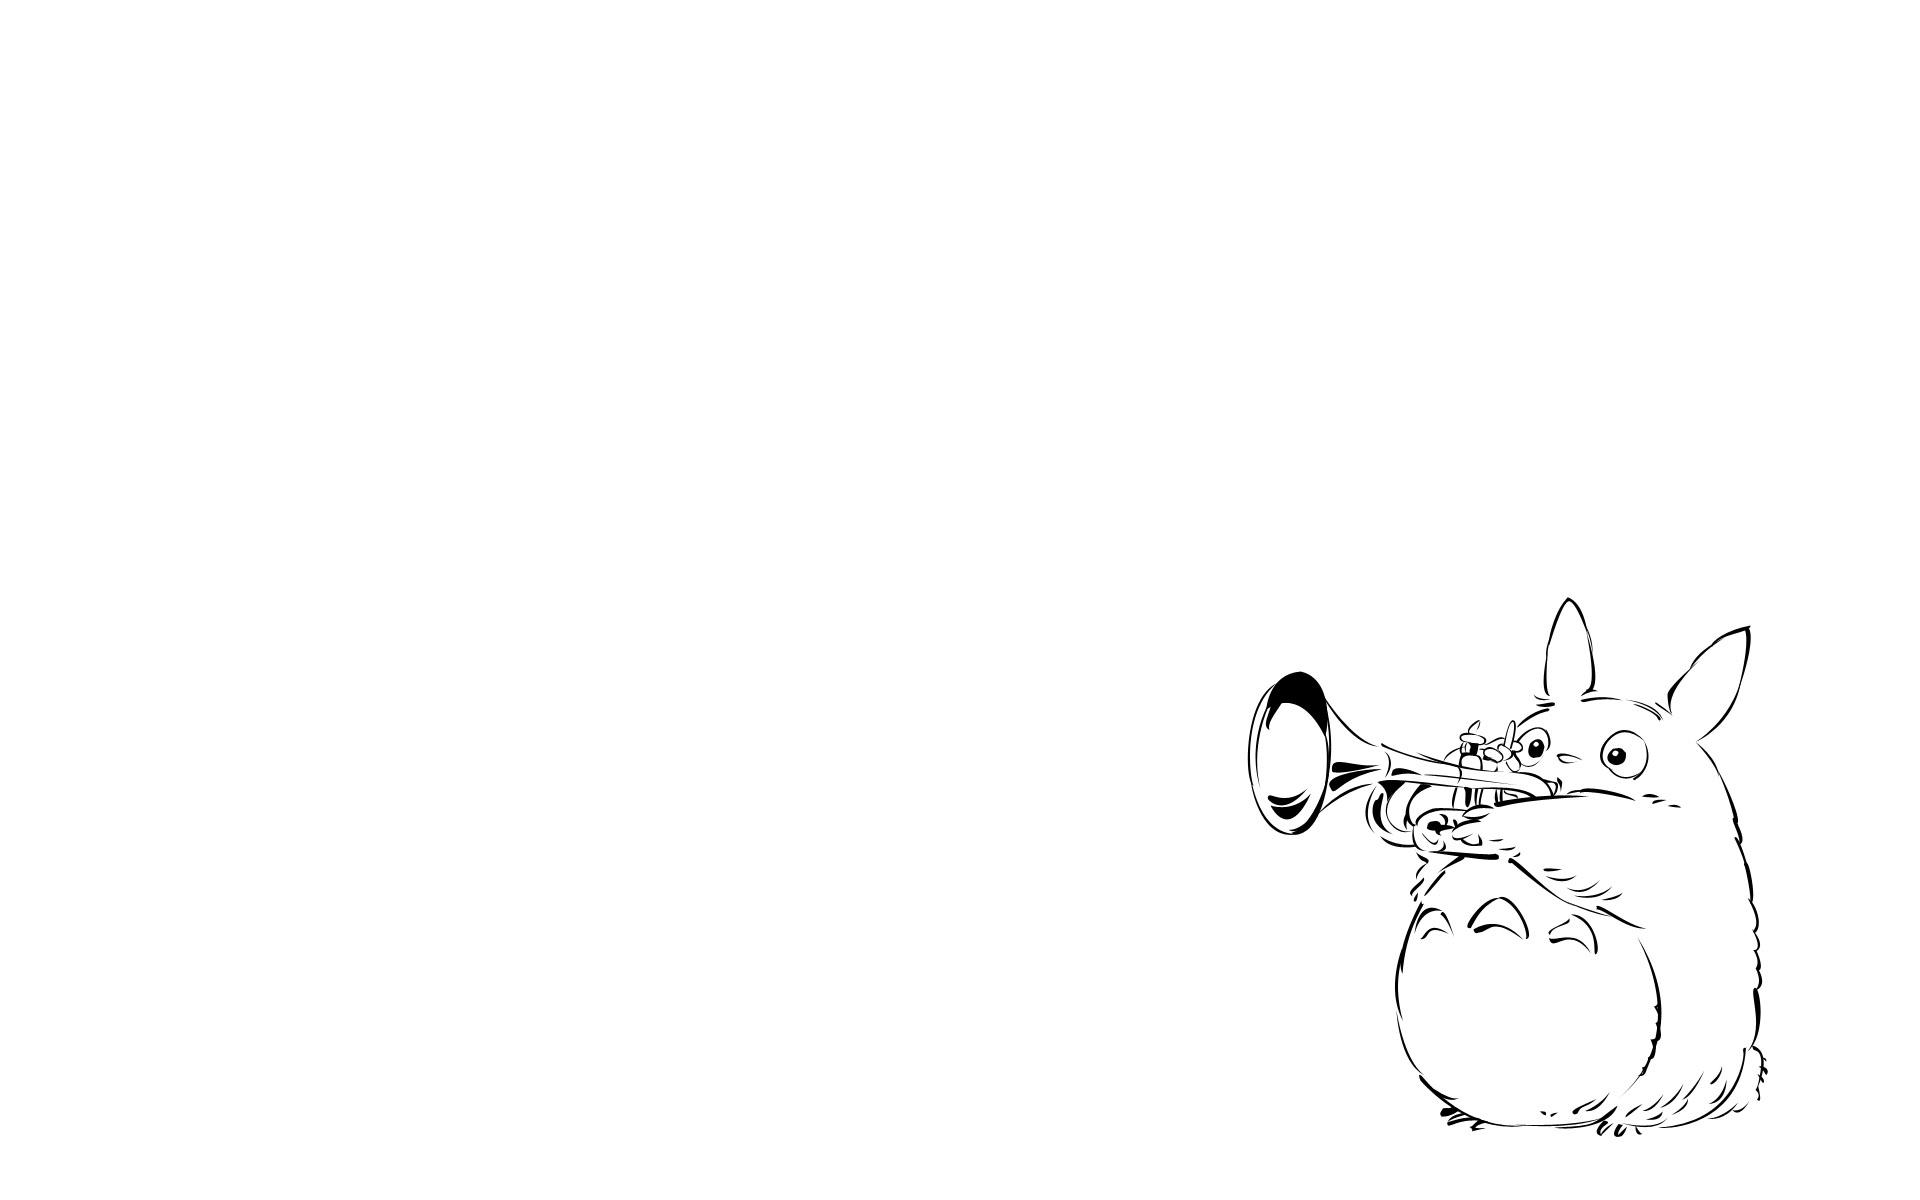 My Neighbor Totoro Res: 1920x1200 / Size:112kb. Views: 39699